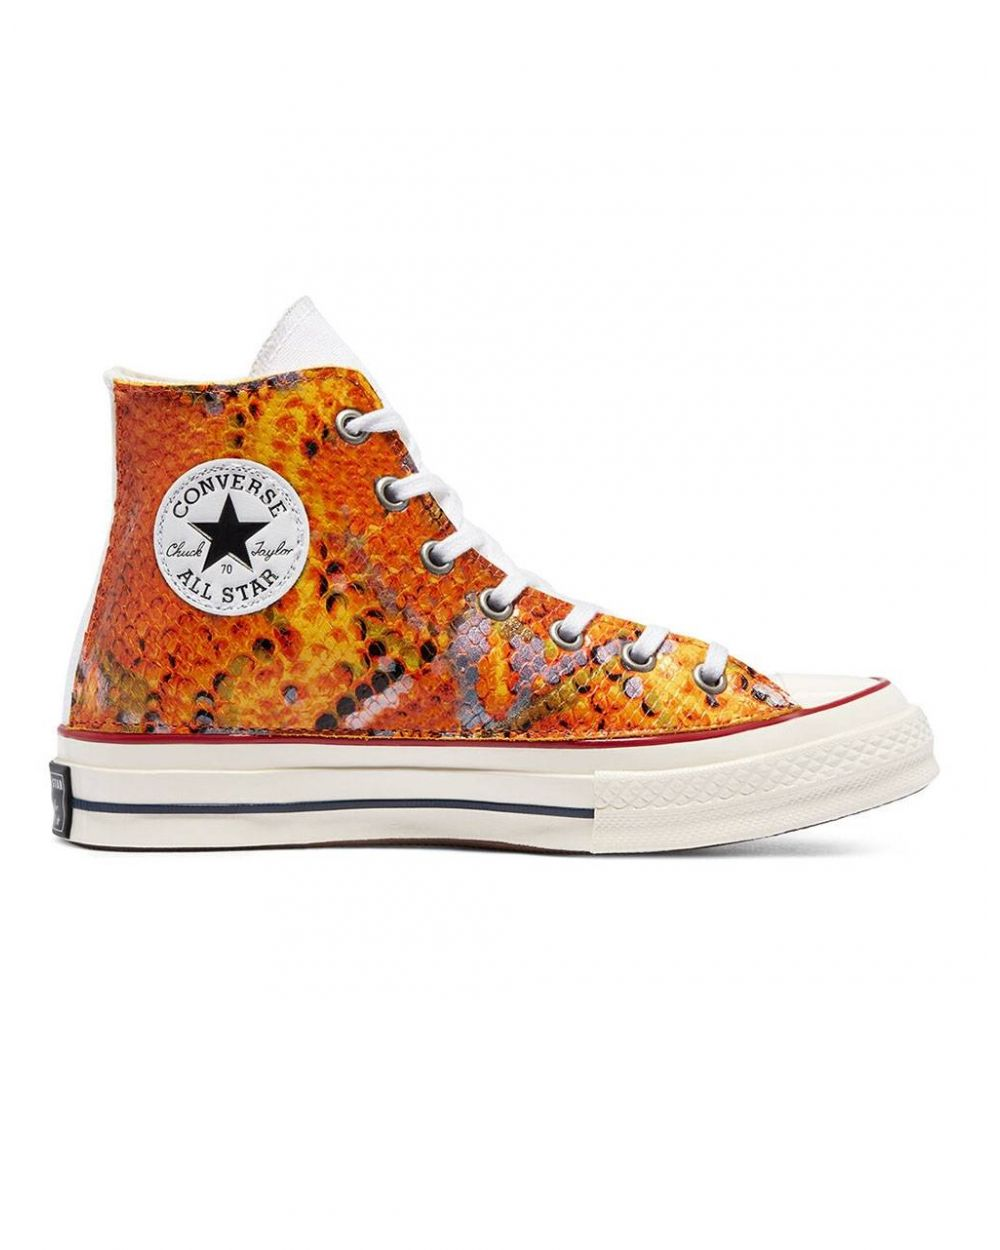 Converse Woman Snake Chuck 70 High Top - orange print python Converse Sneakers 122,13€